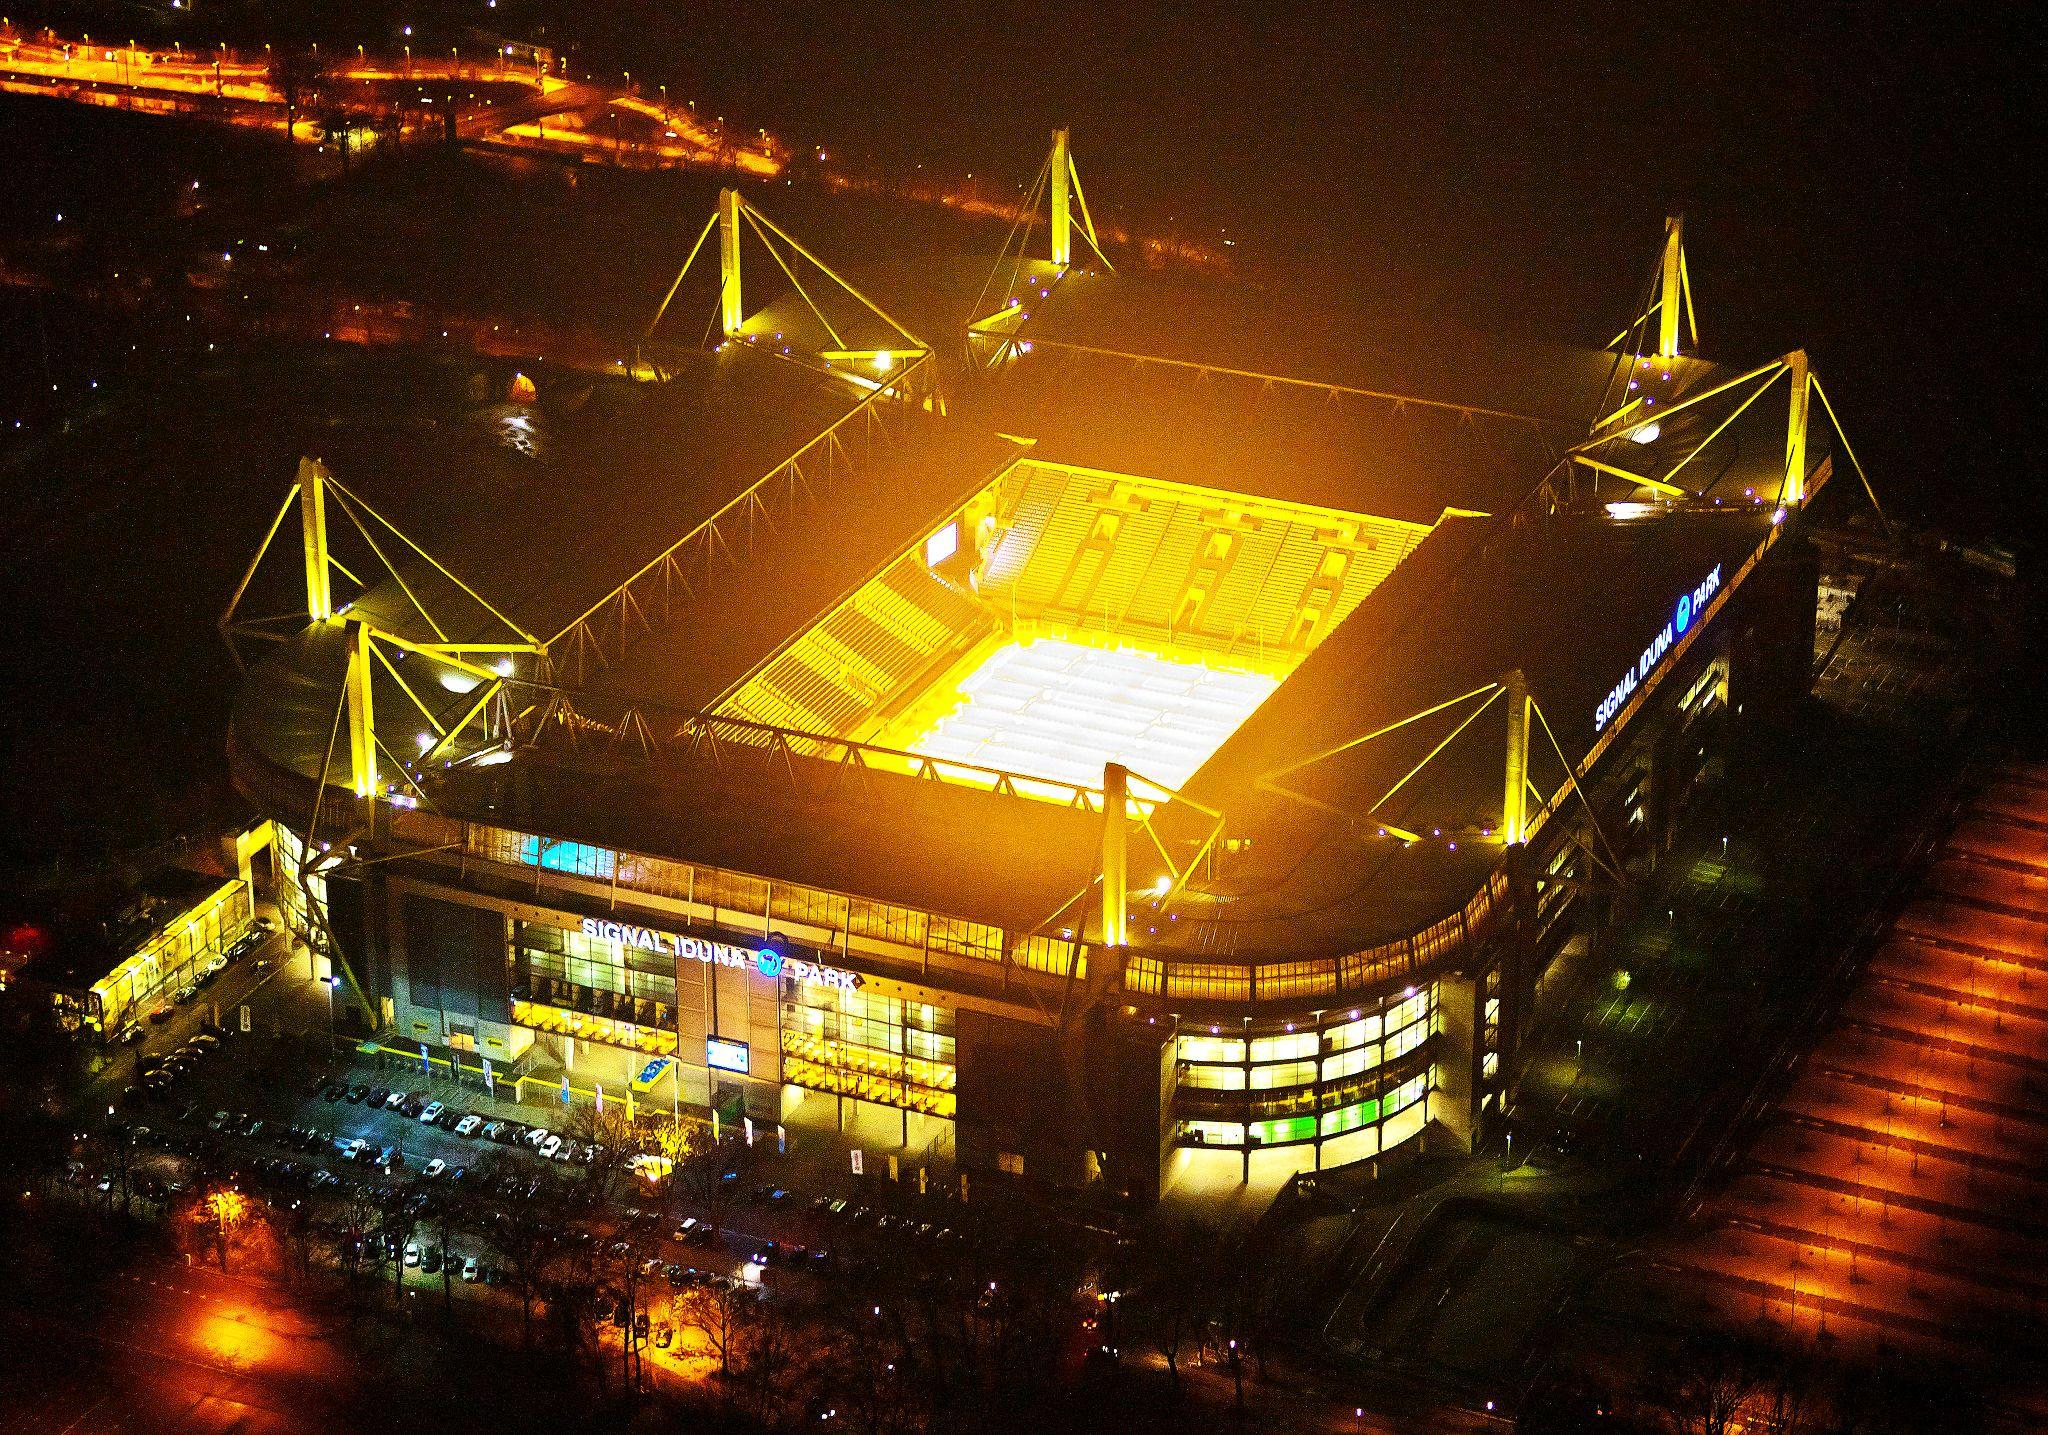 Westfalenstadion at night | Borussia dortmund, Futebol